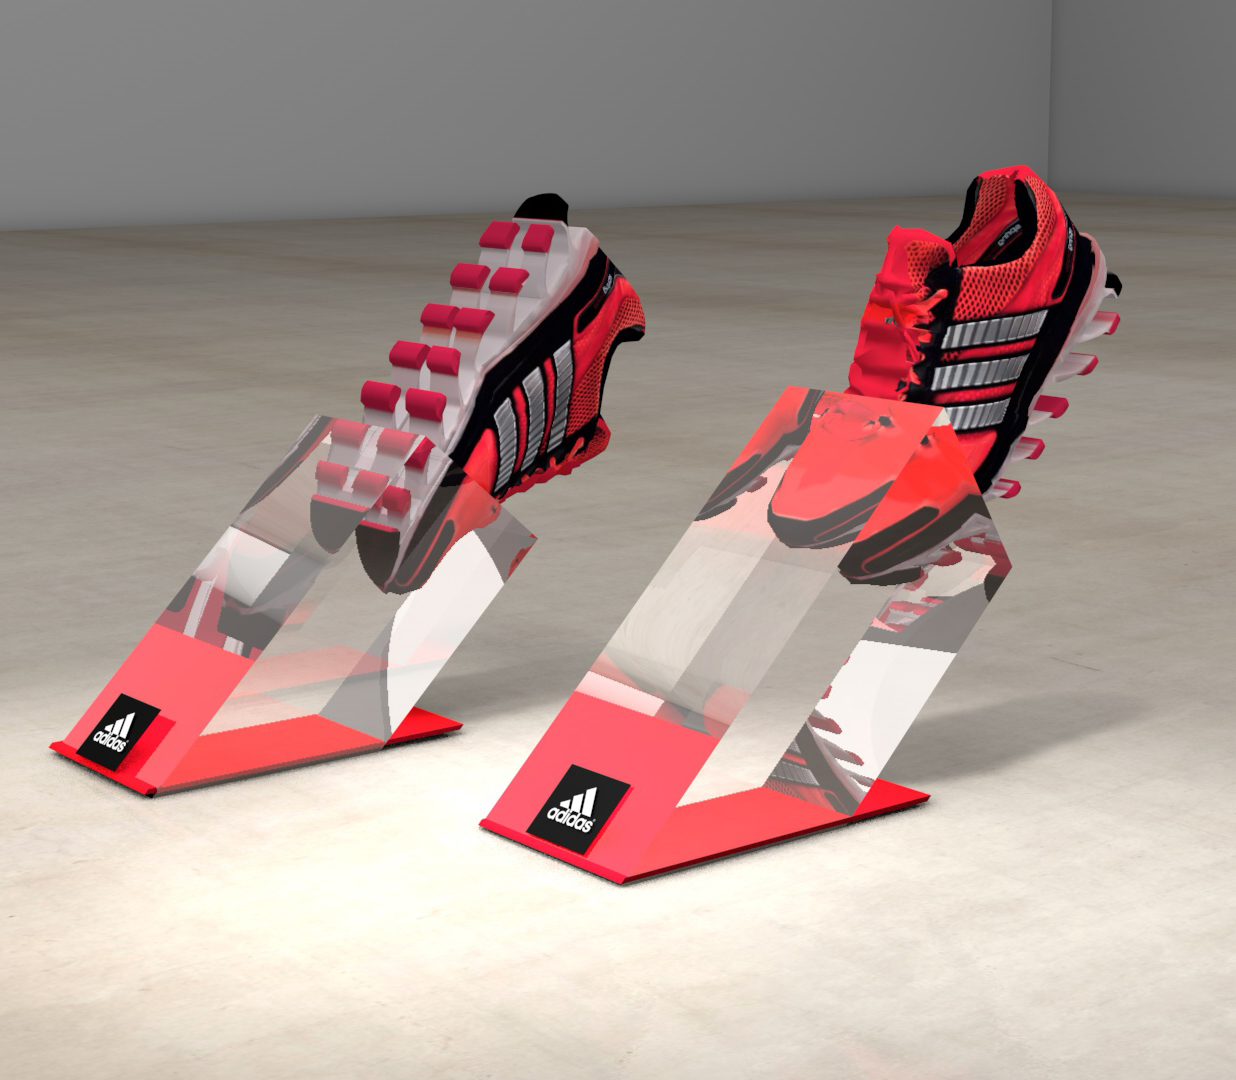 adidas Springblade shoe highlight renders